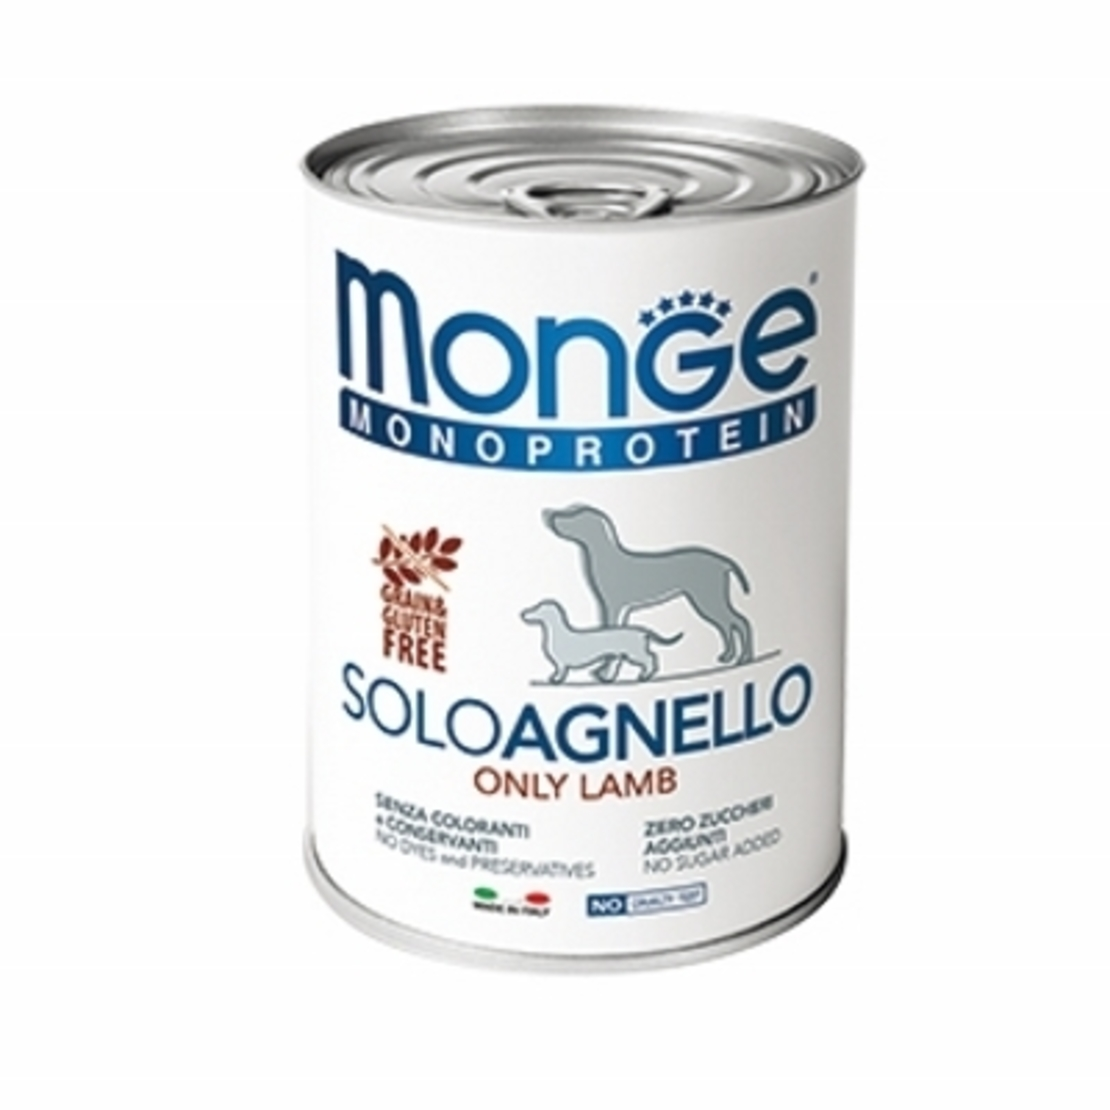 MONGE מונג' מזון רטוב לכלבים מונו פרוטאין בטעם כבש 400 גרם